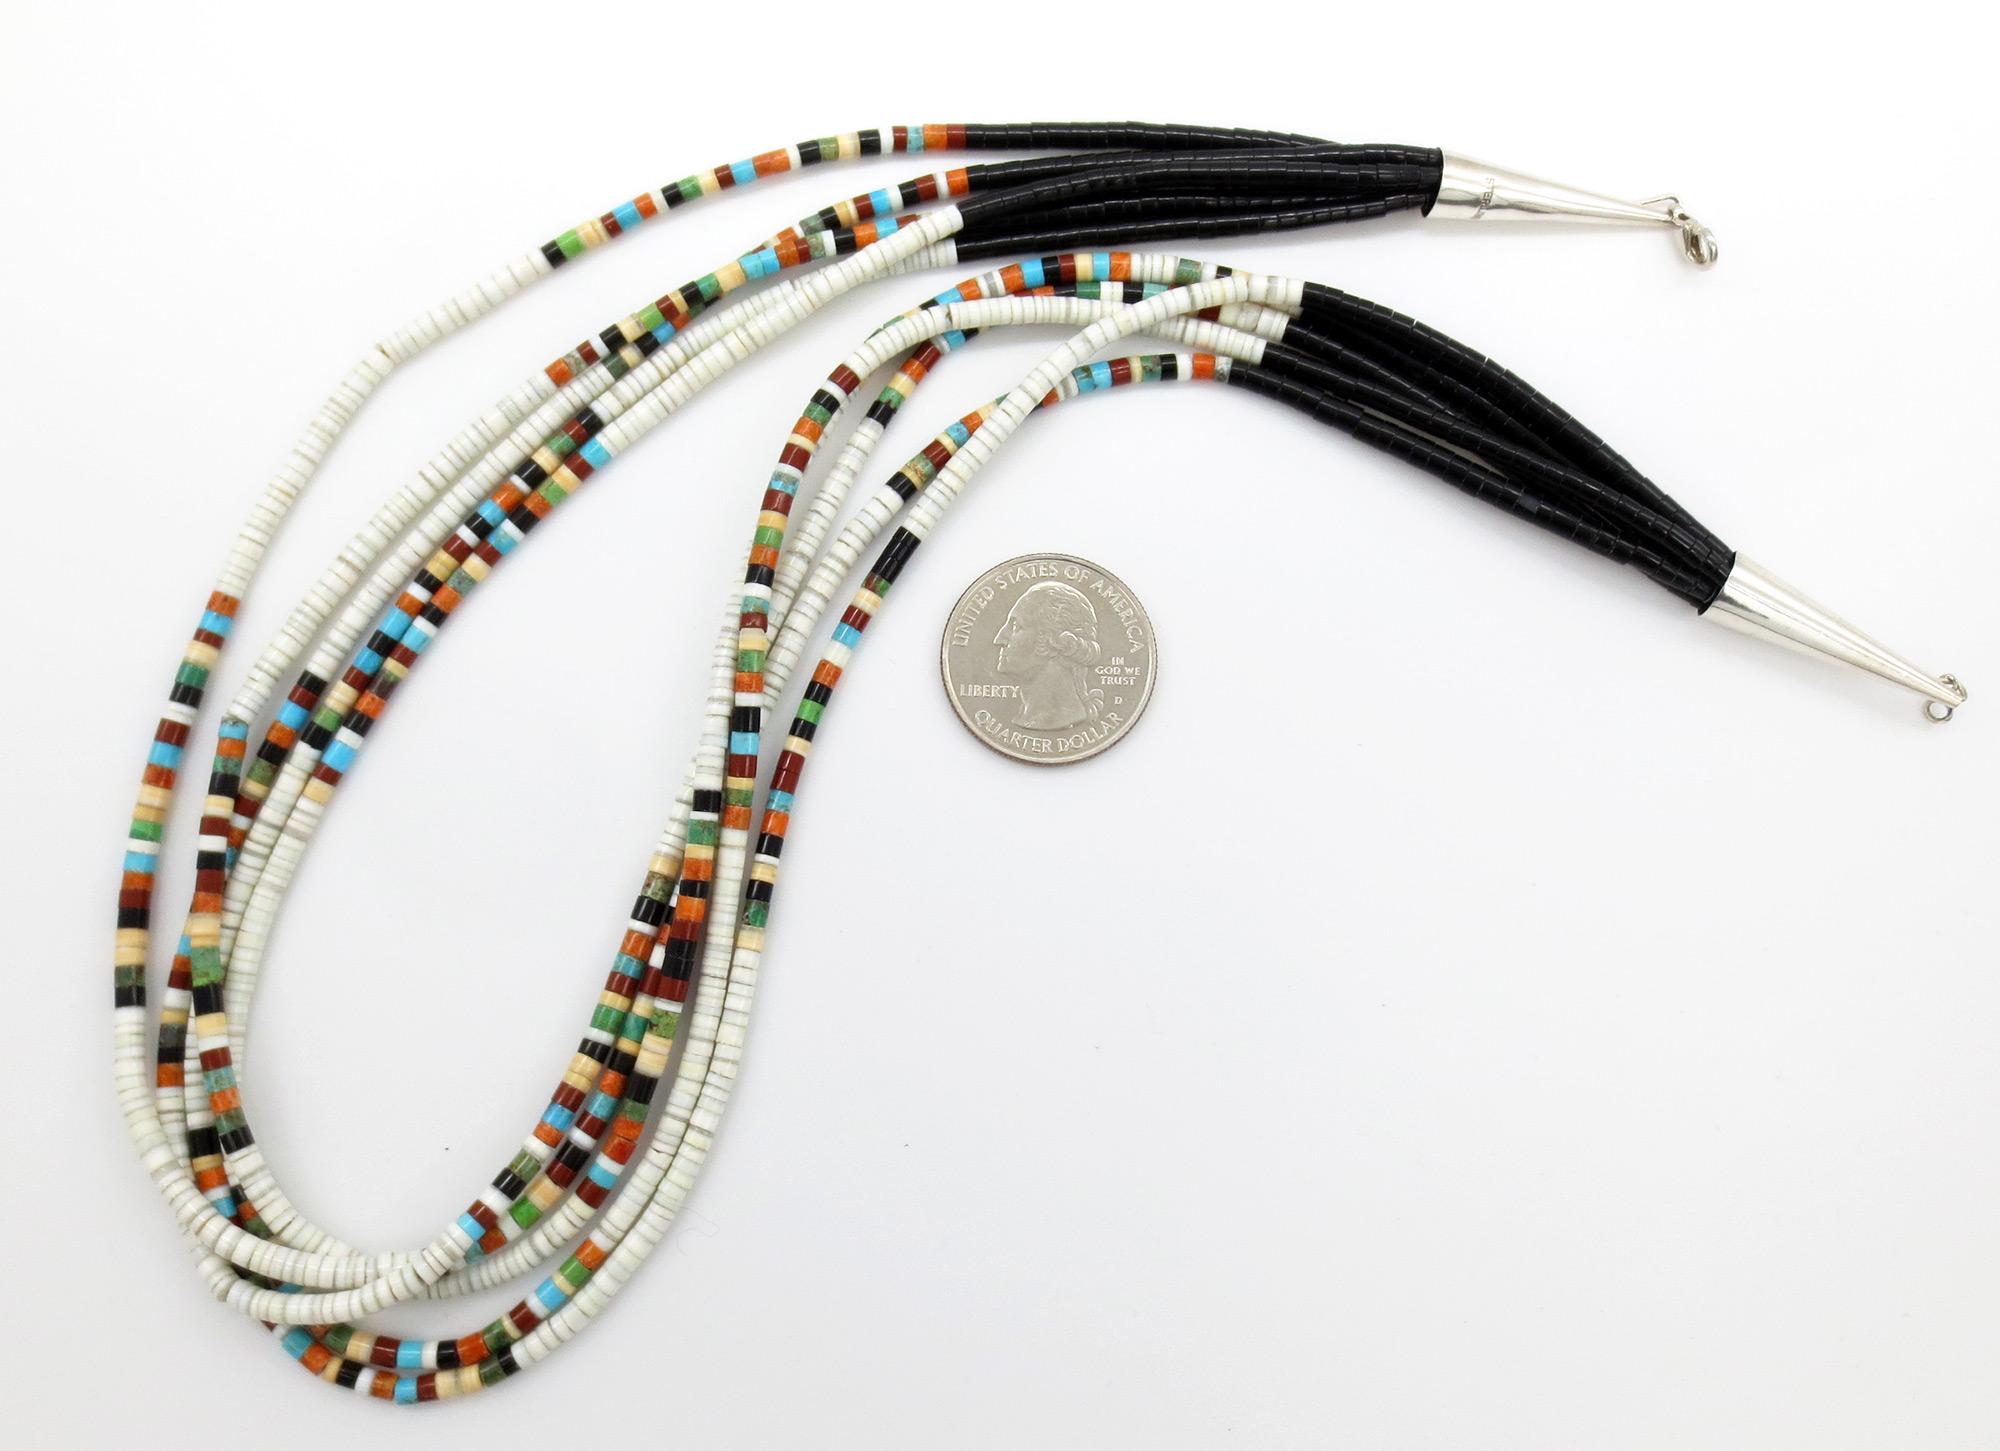 Image 3 of Santo Domingo 5 Strand Heishi Necklace Native American Jewelry - 3846rio